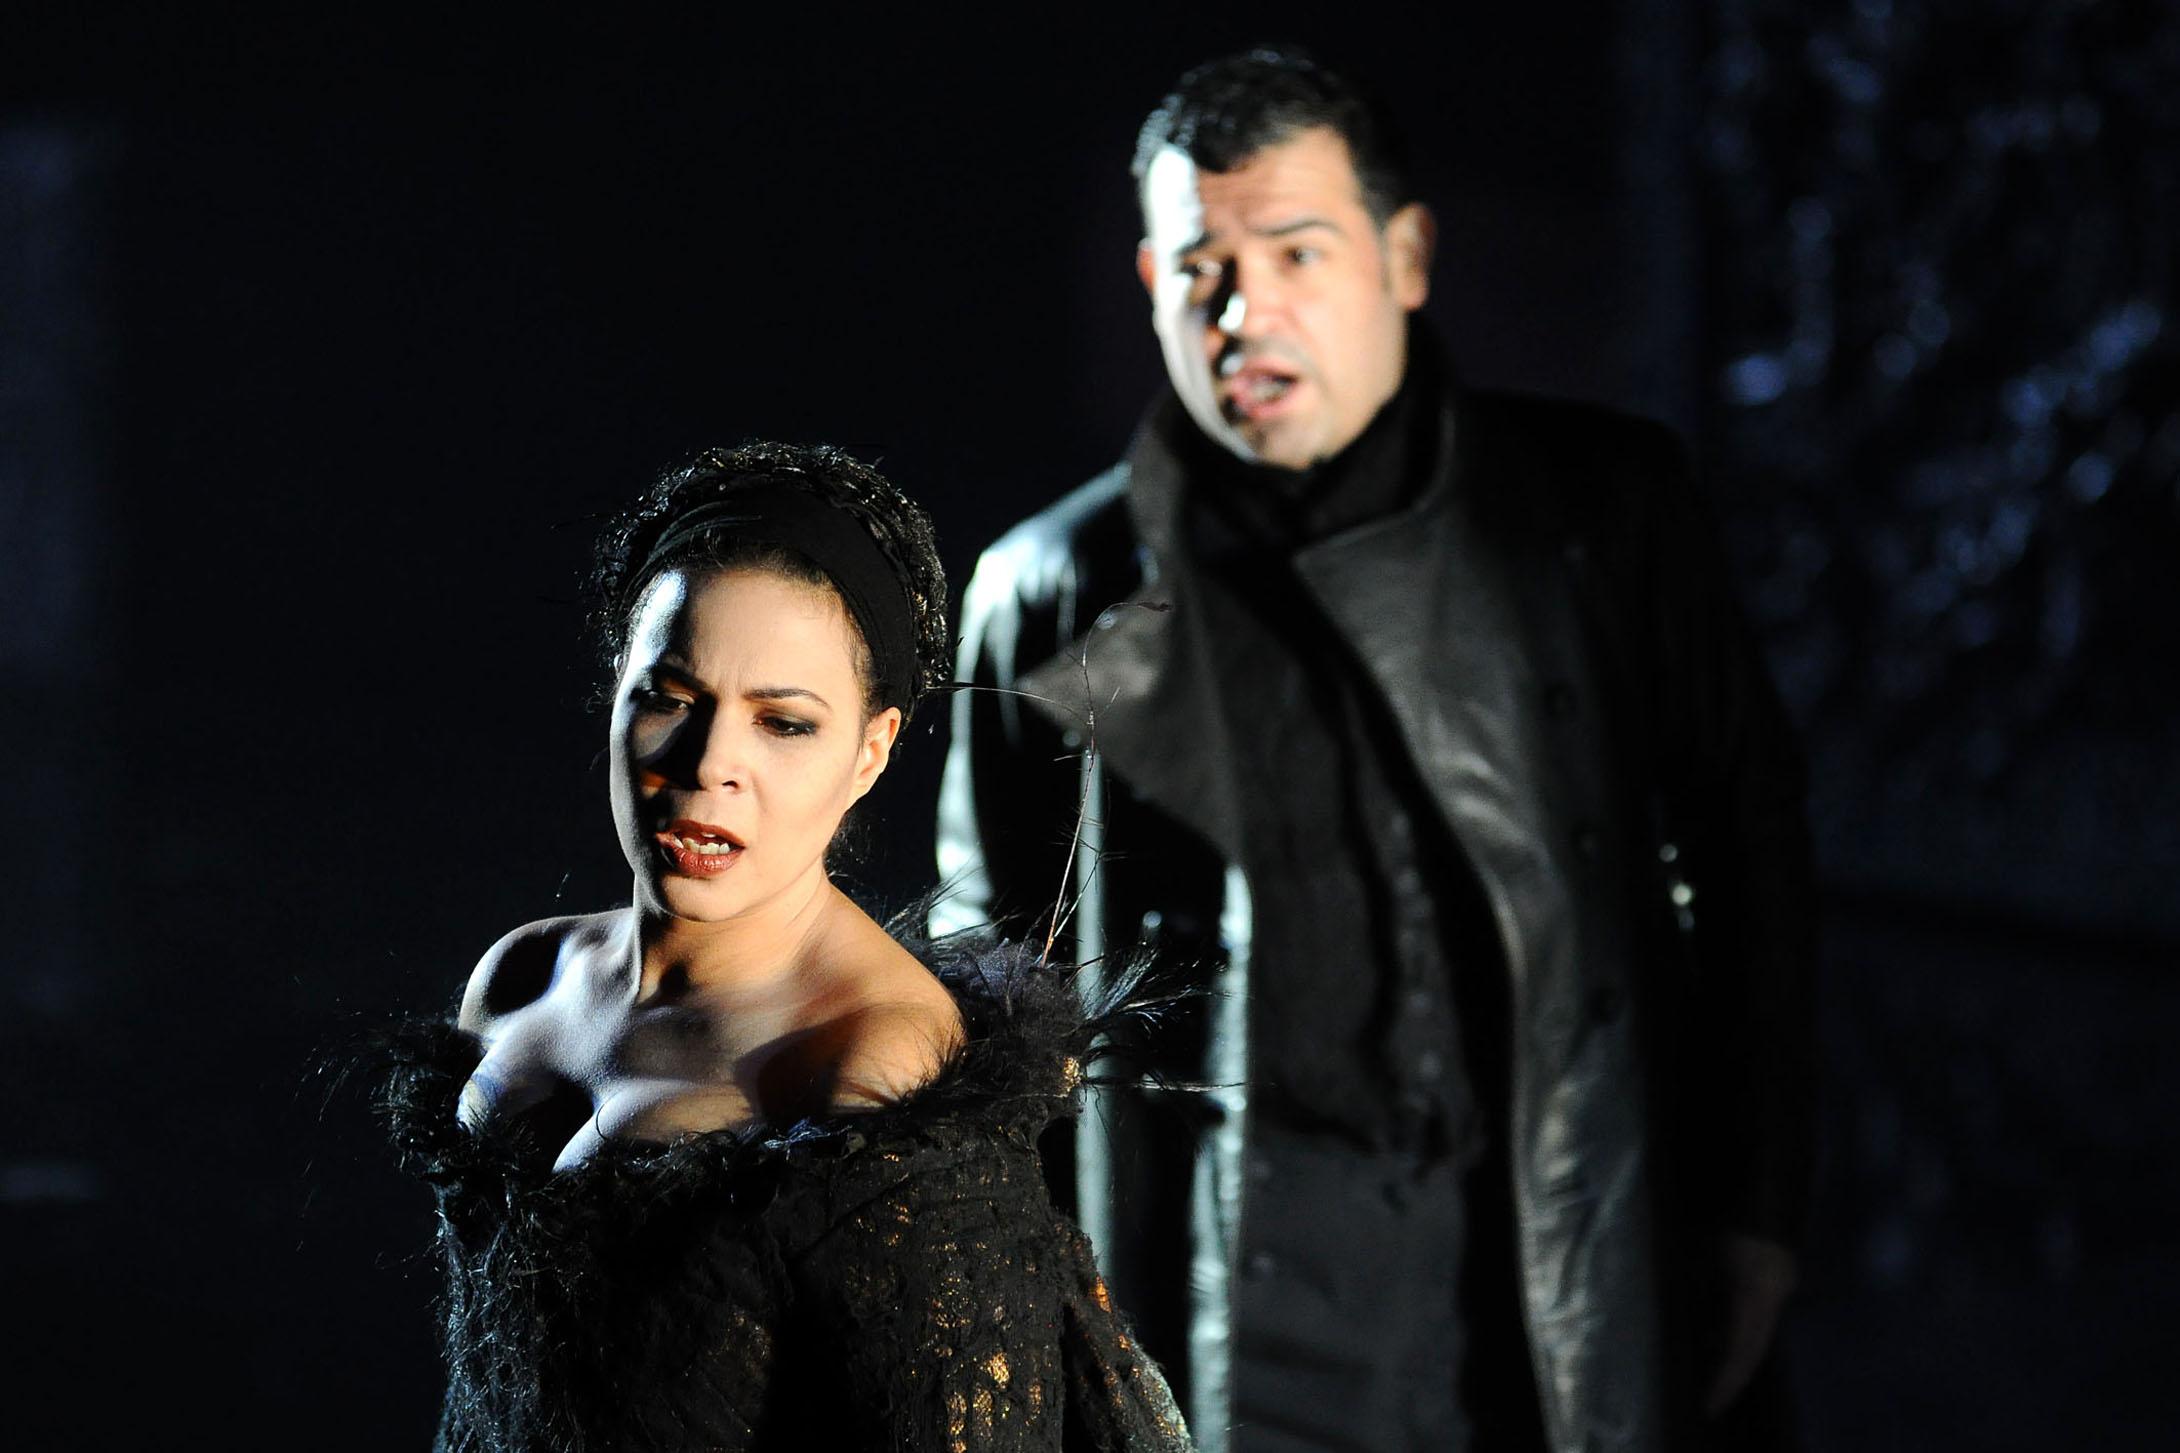 La Forza, Teatro Regio Parma 2011